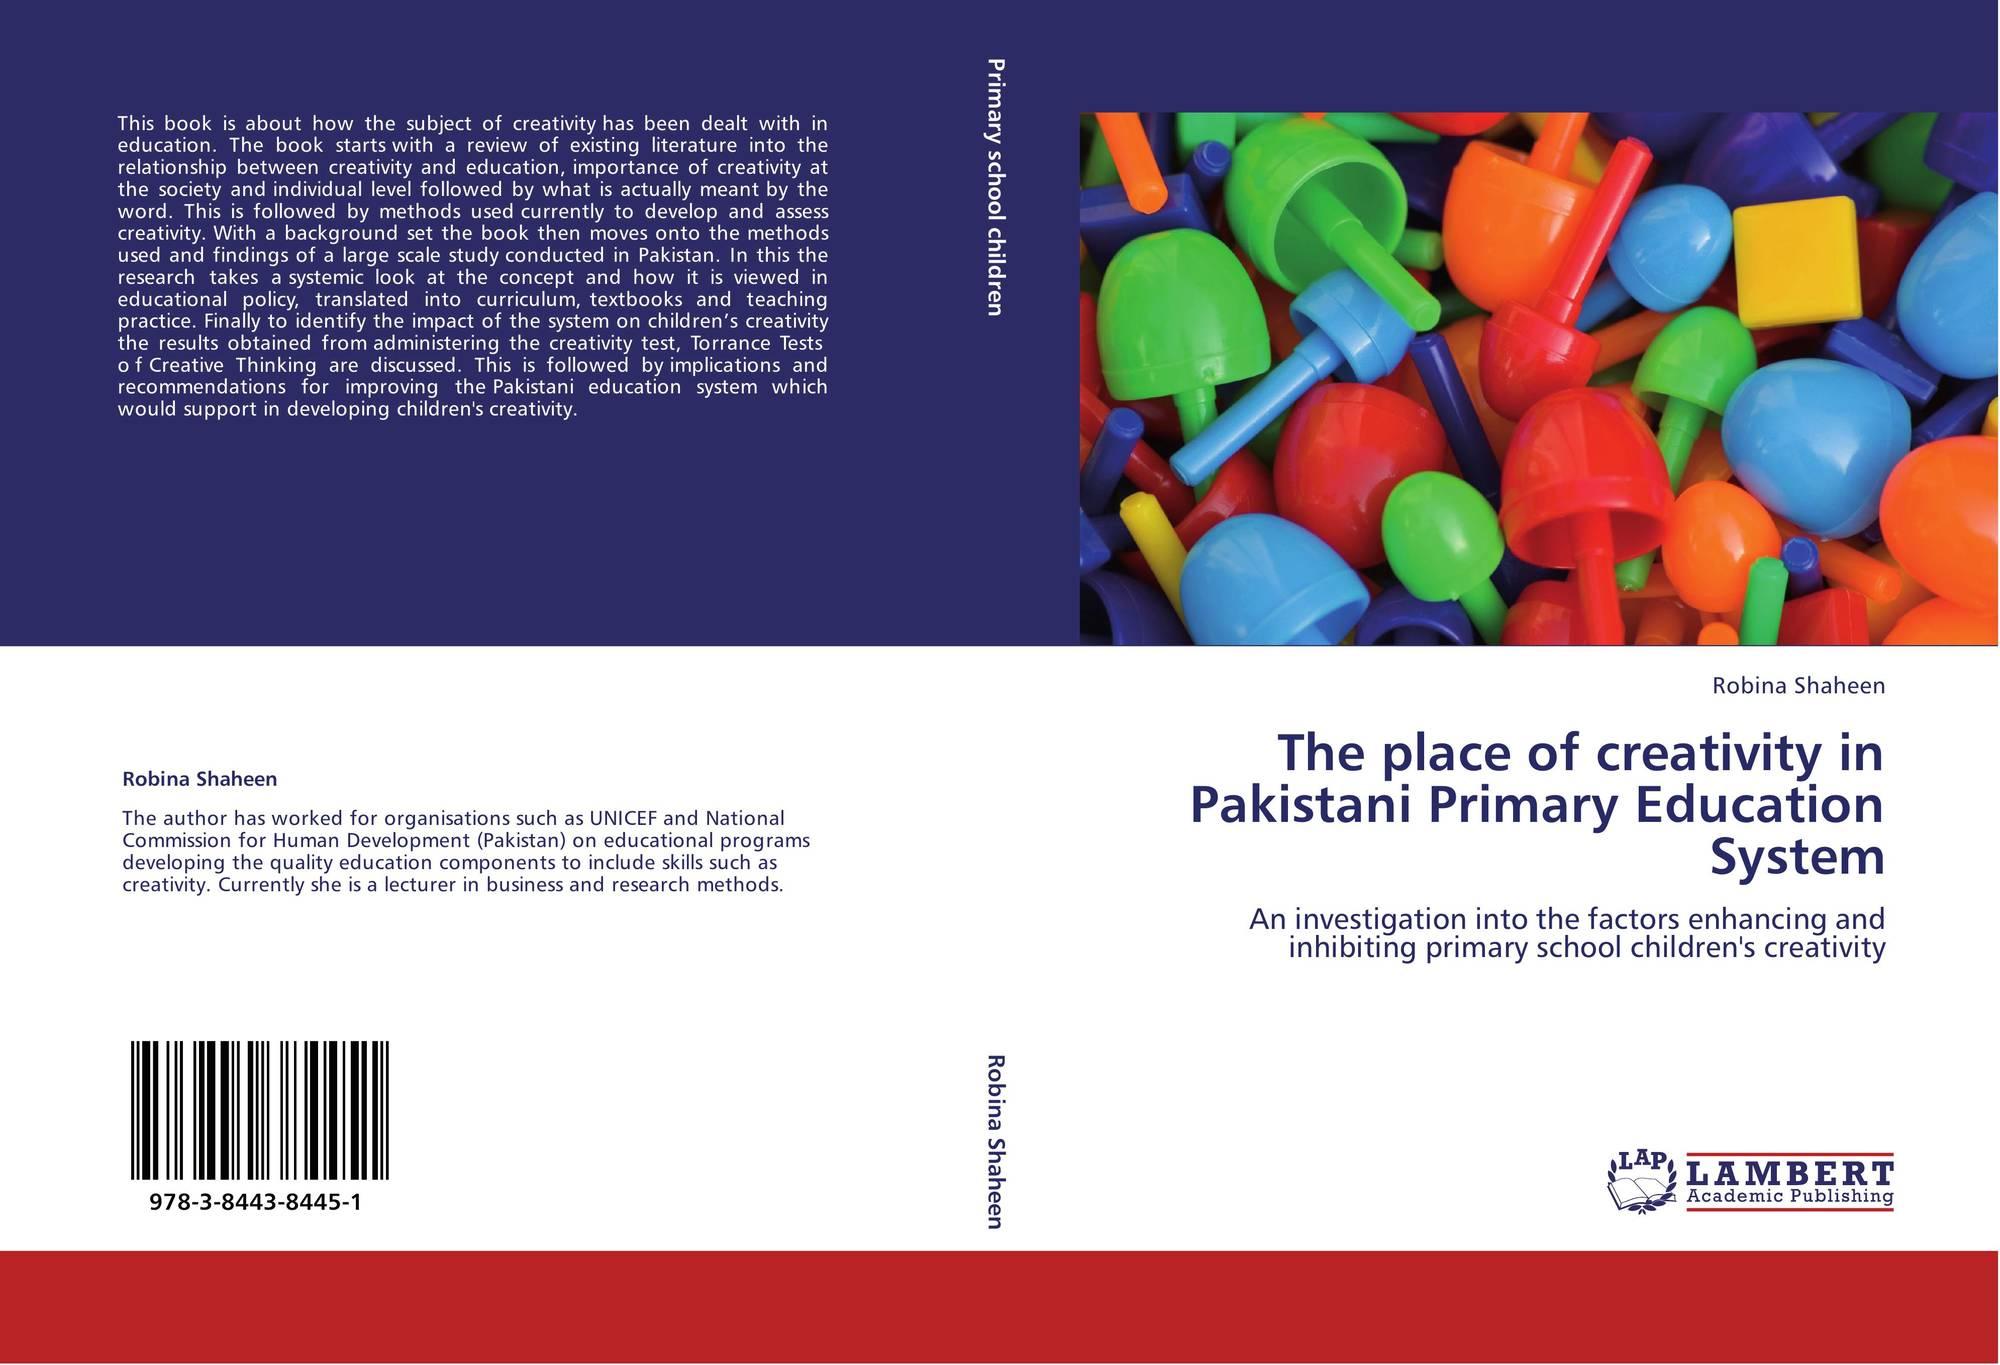 pakistani studies textbook and educational system History & pakistan studies social studies / sociology school textbooks / computer studies computer studies children's books higher education.